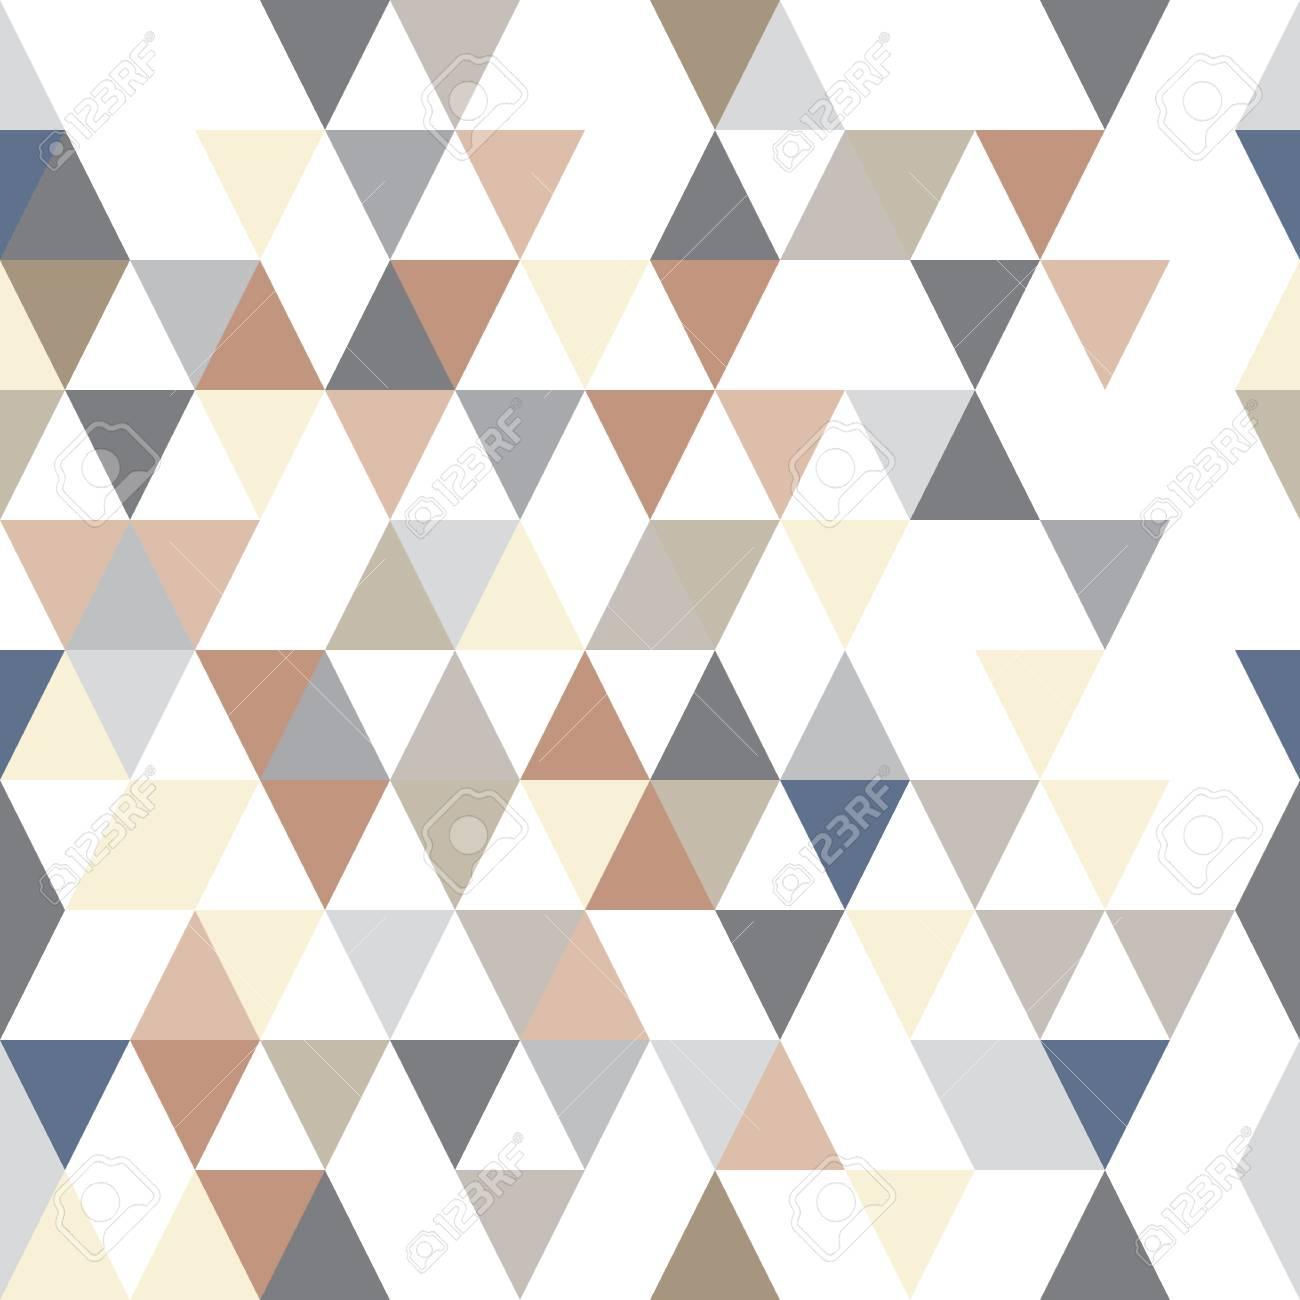 Seamless Scandinavian Pattern Textile Background Wrapping 1300x1300